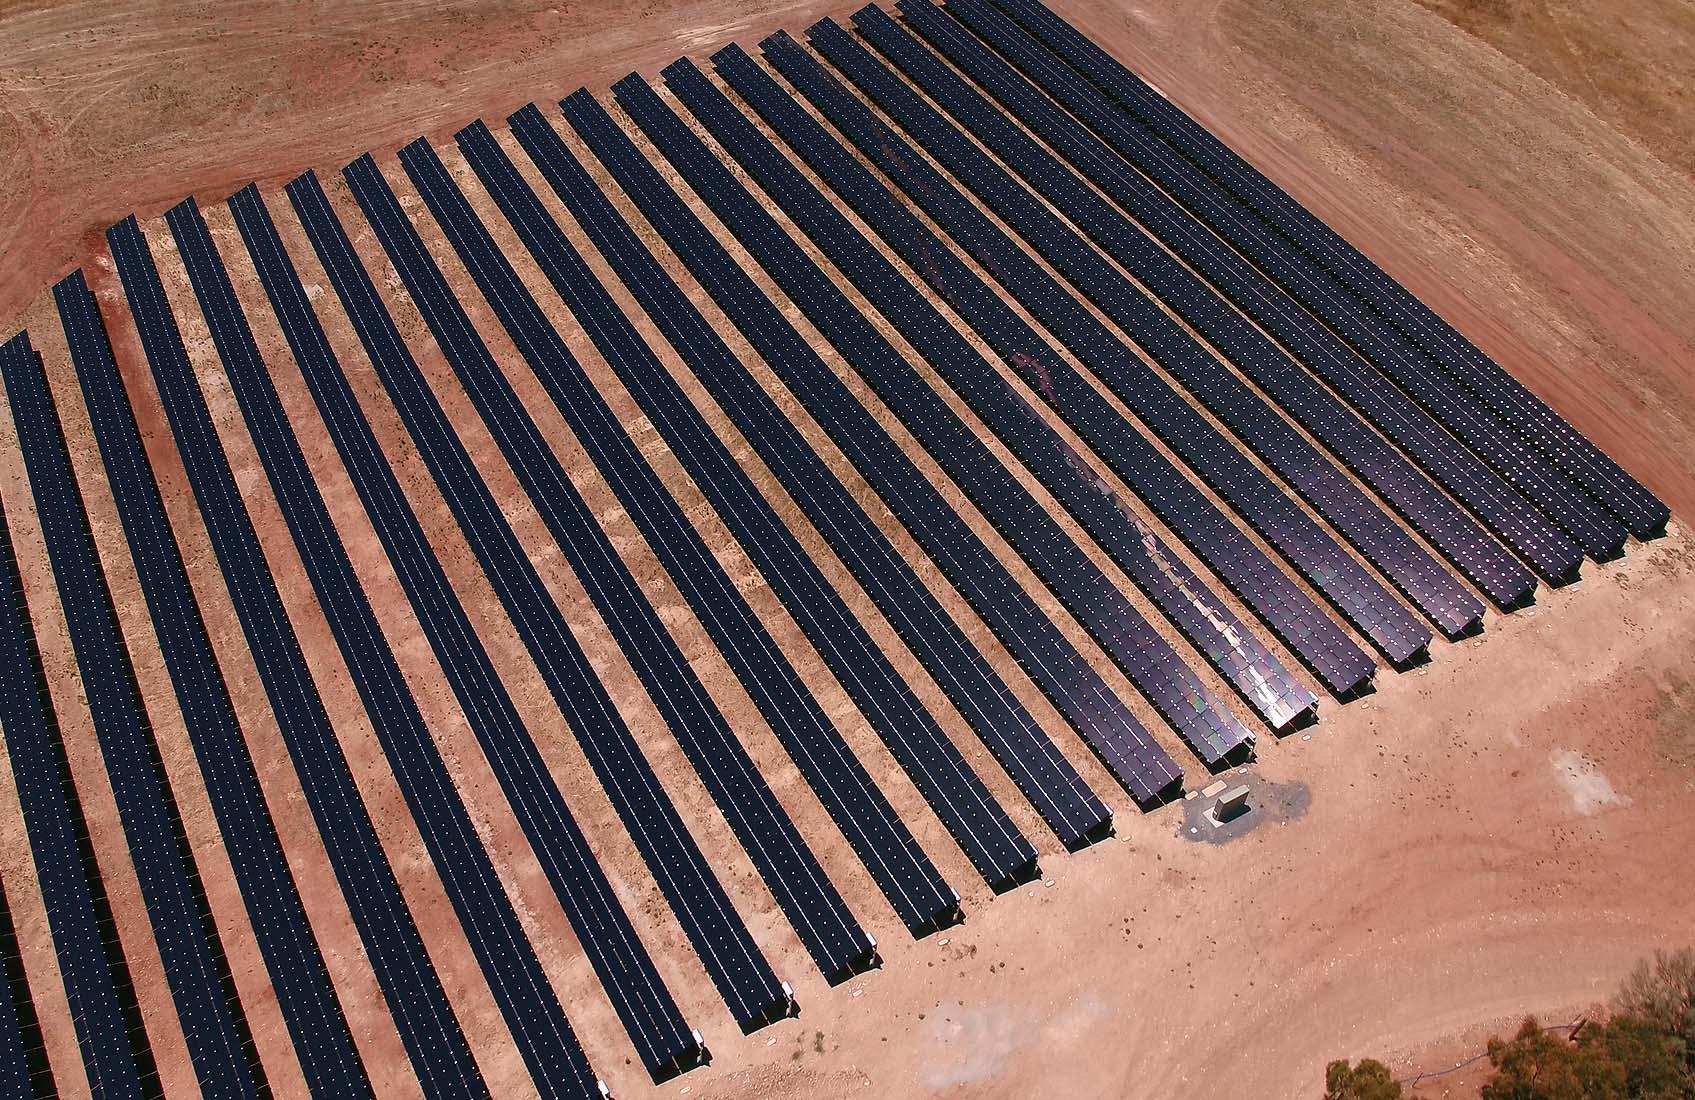 NAWMA Renewable Energy Facility